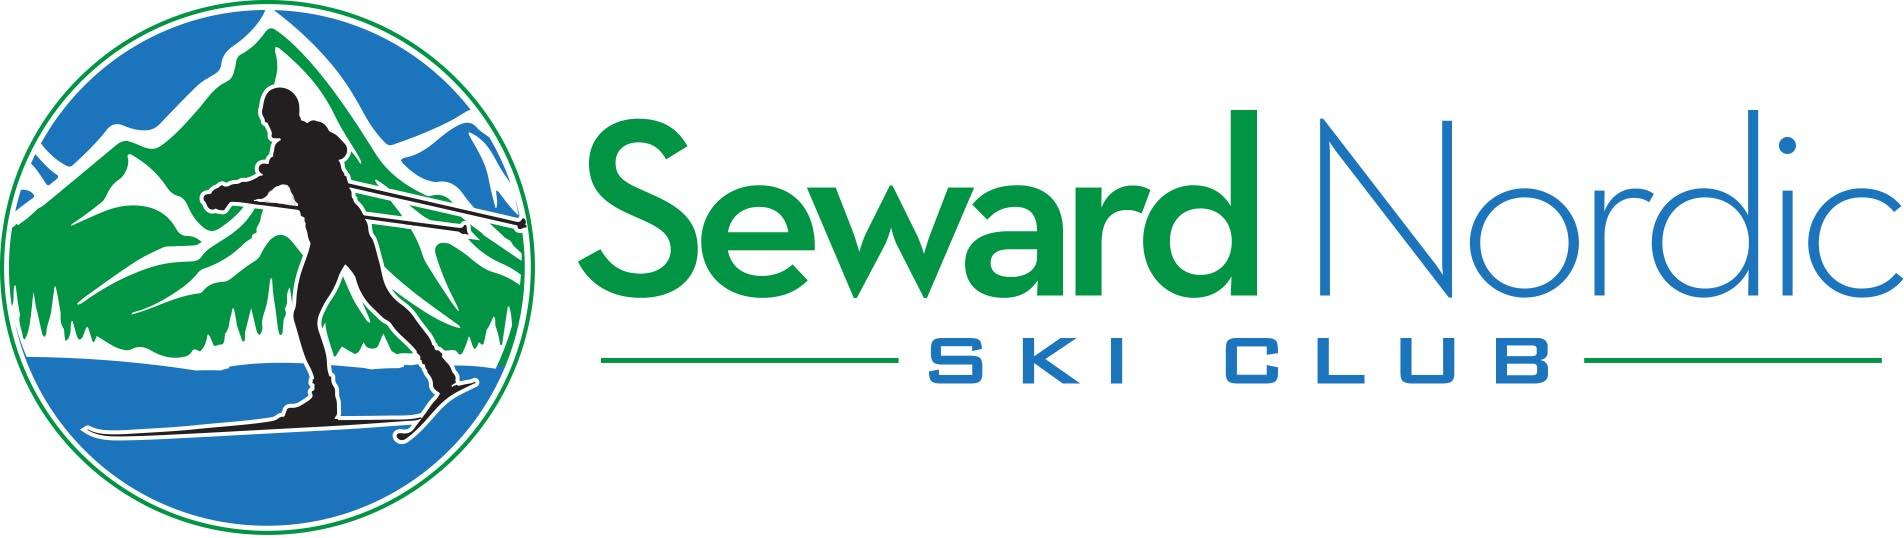 seward_nordic_3.jpg